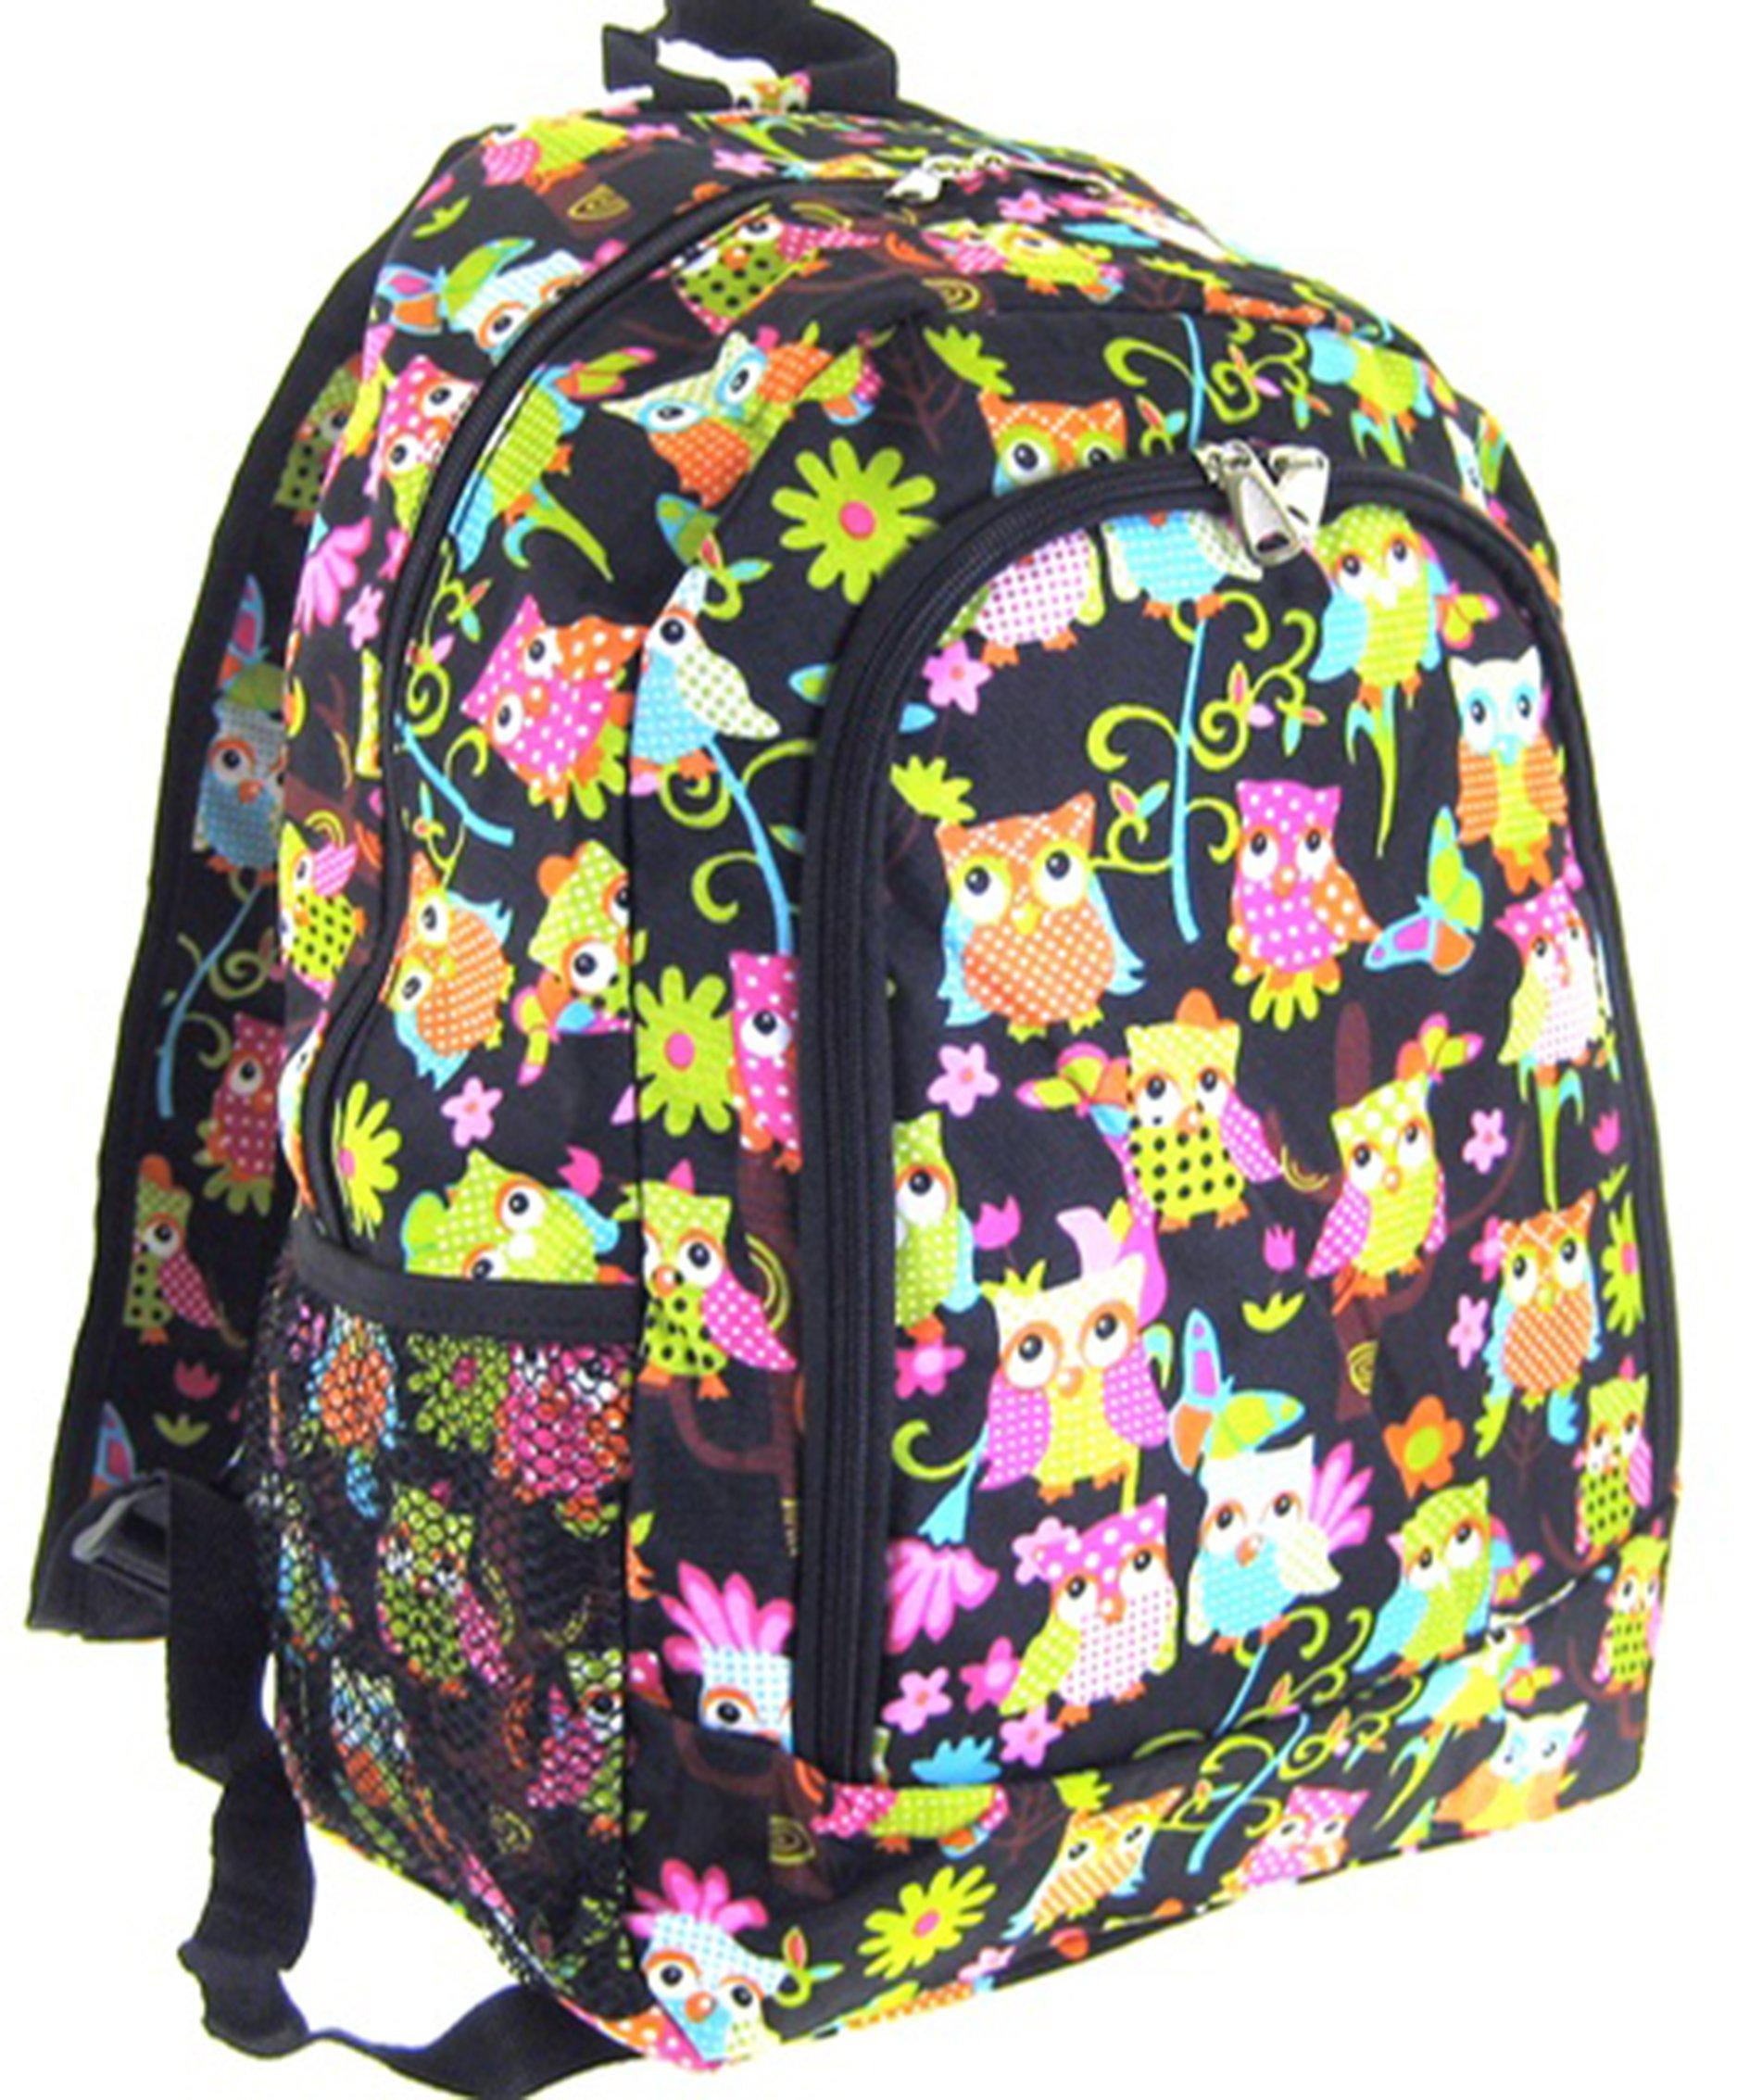 Owl Print 16'' Backpack School Travel Teen Girls Dance Cheer Diaper Bag